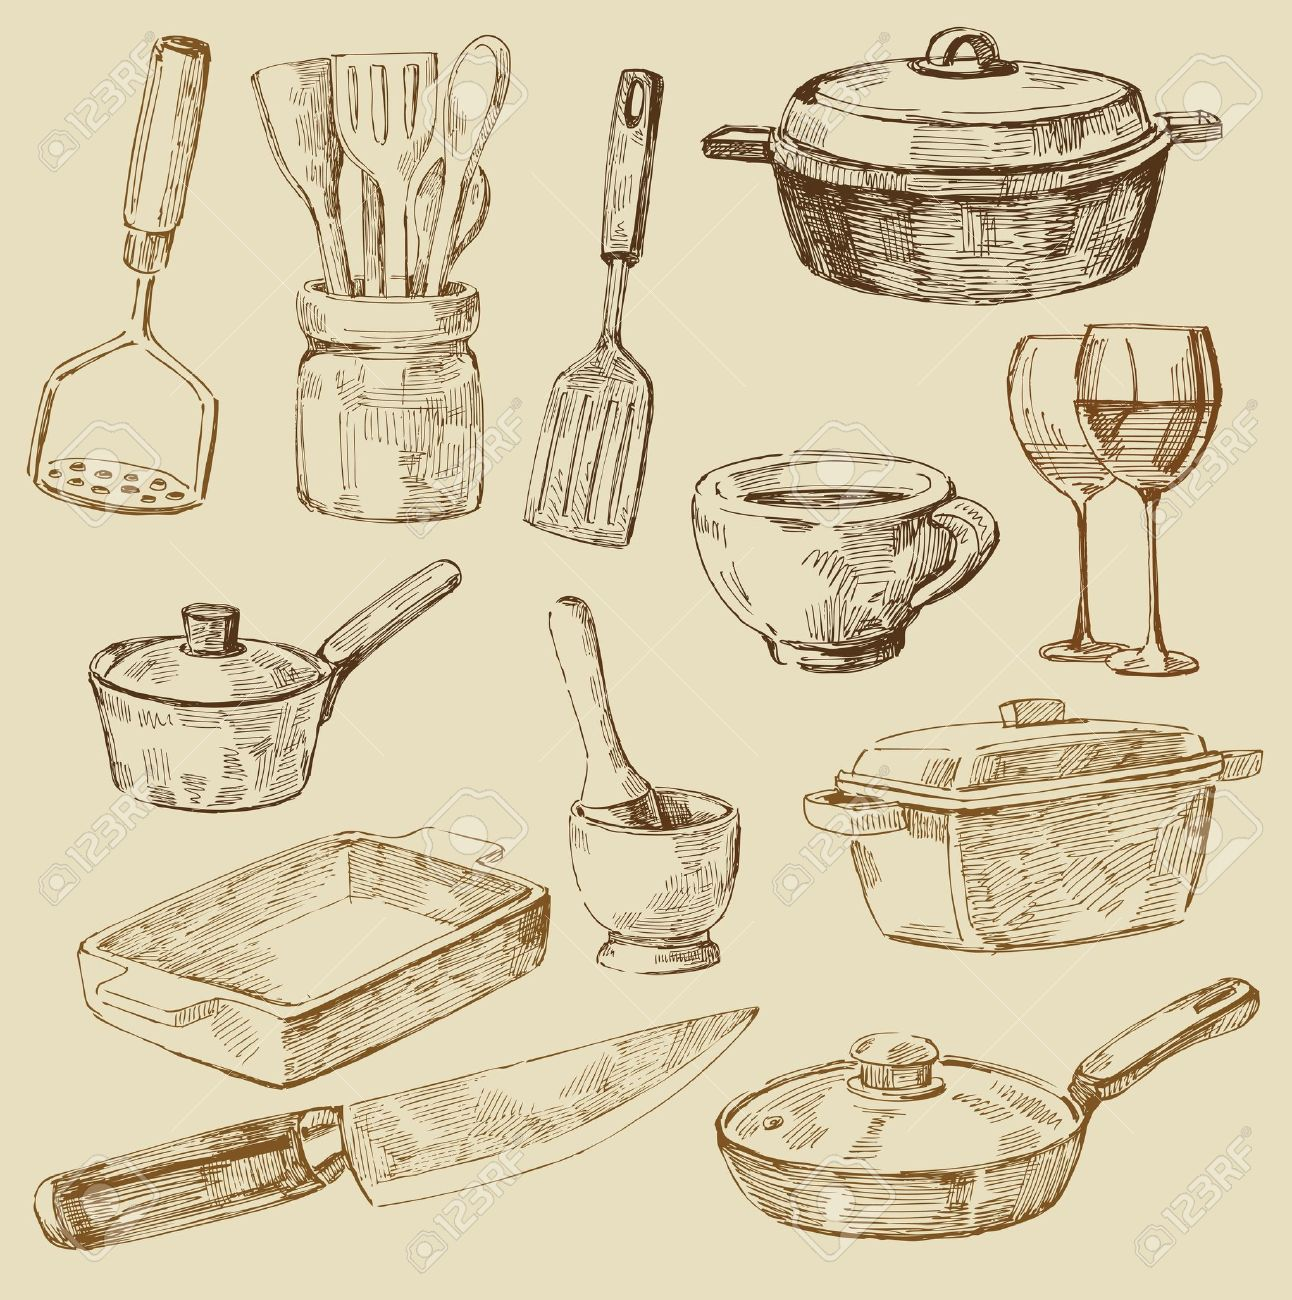 Vintage Kitchen Utensils Illustration vintage kitchen illustration